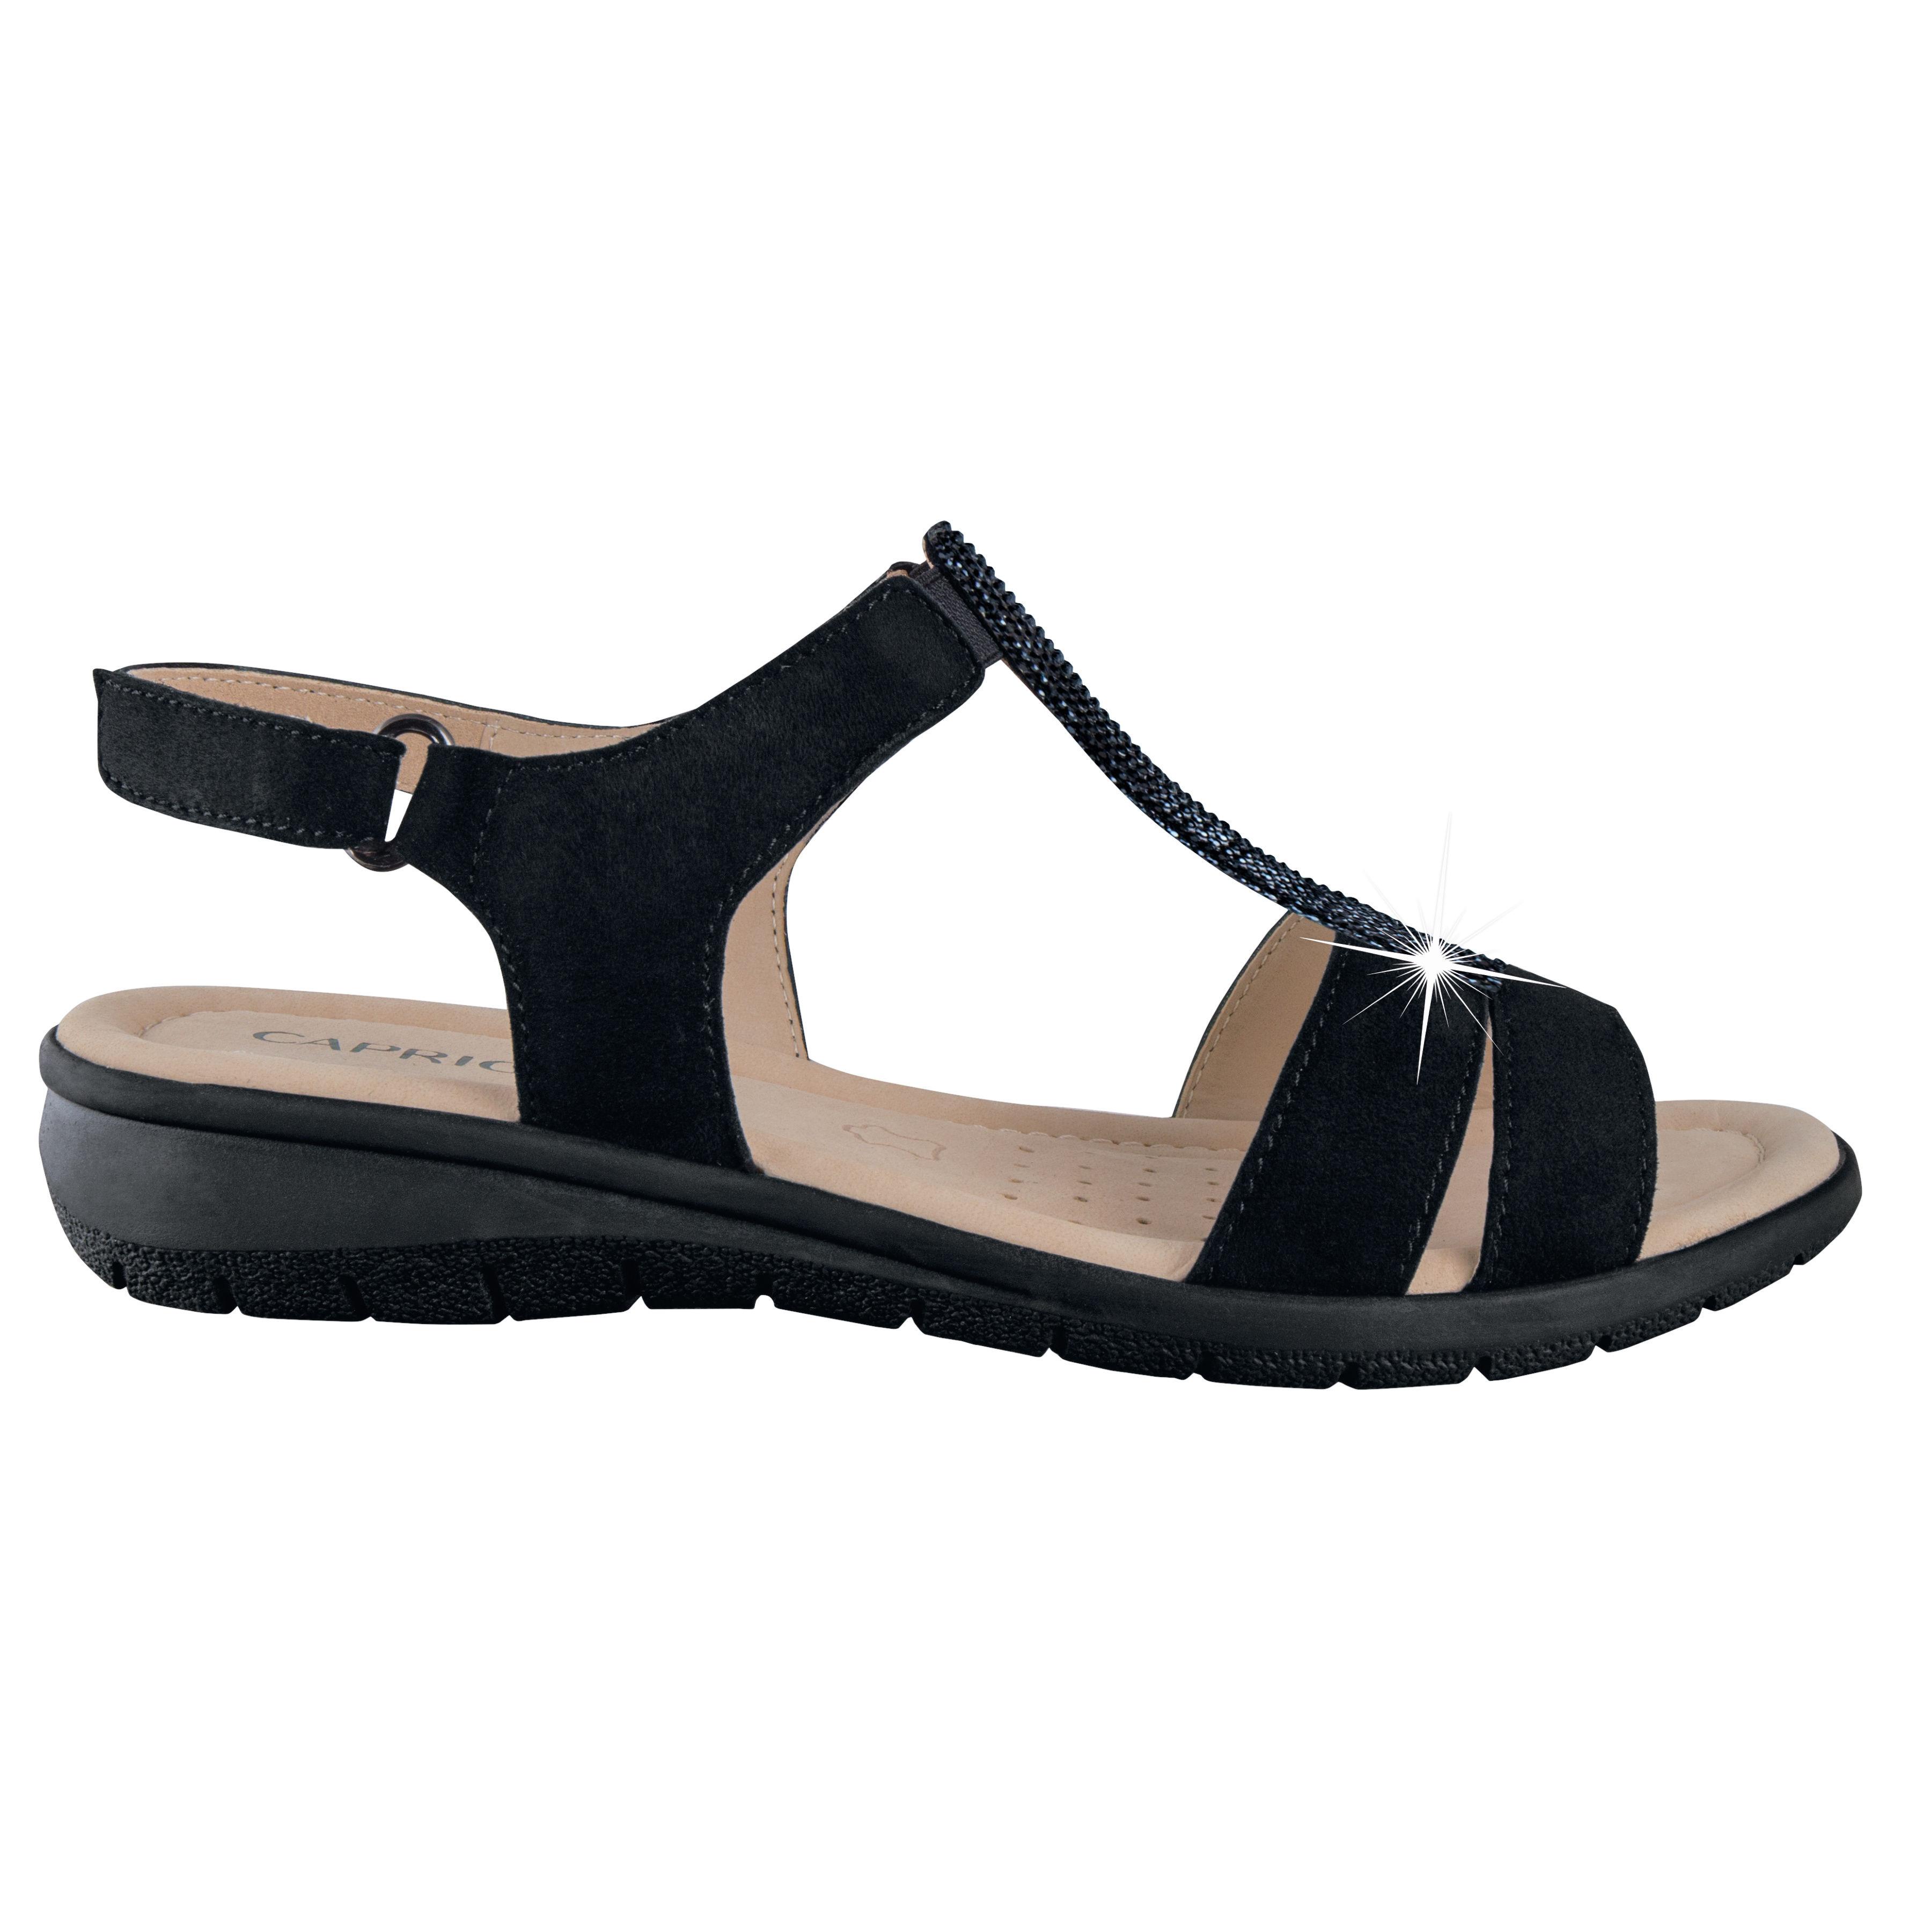 Nubuckleder Damen Schwarz Caprice Caprice Caprice Sandalette Damen Nubuckleder Schwarz Sandalette Sandalette Nubuckleder 4qj5L3AR